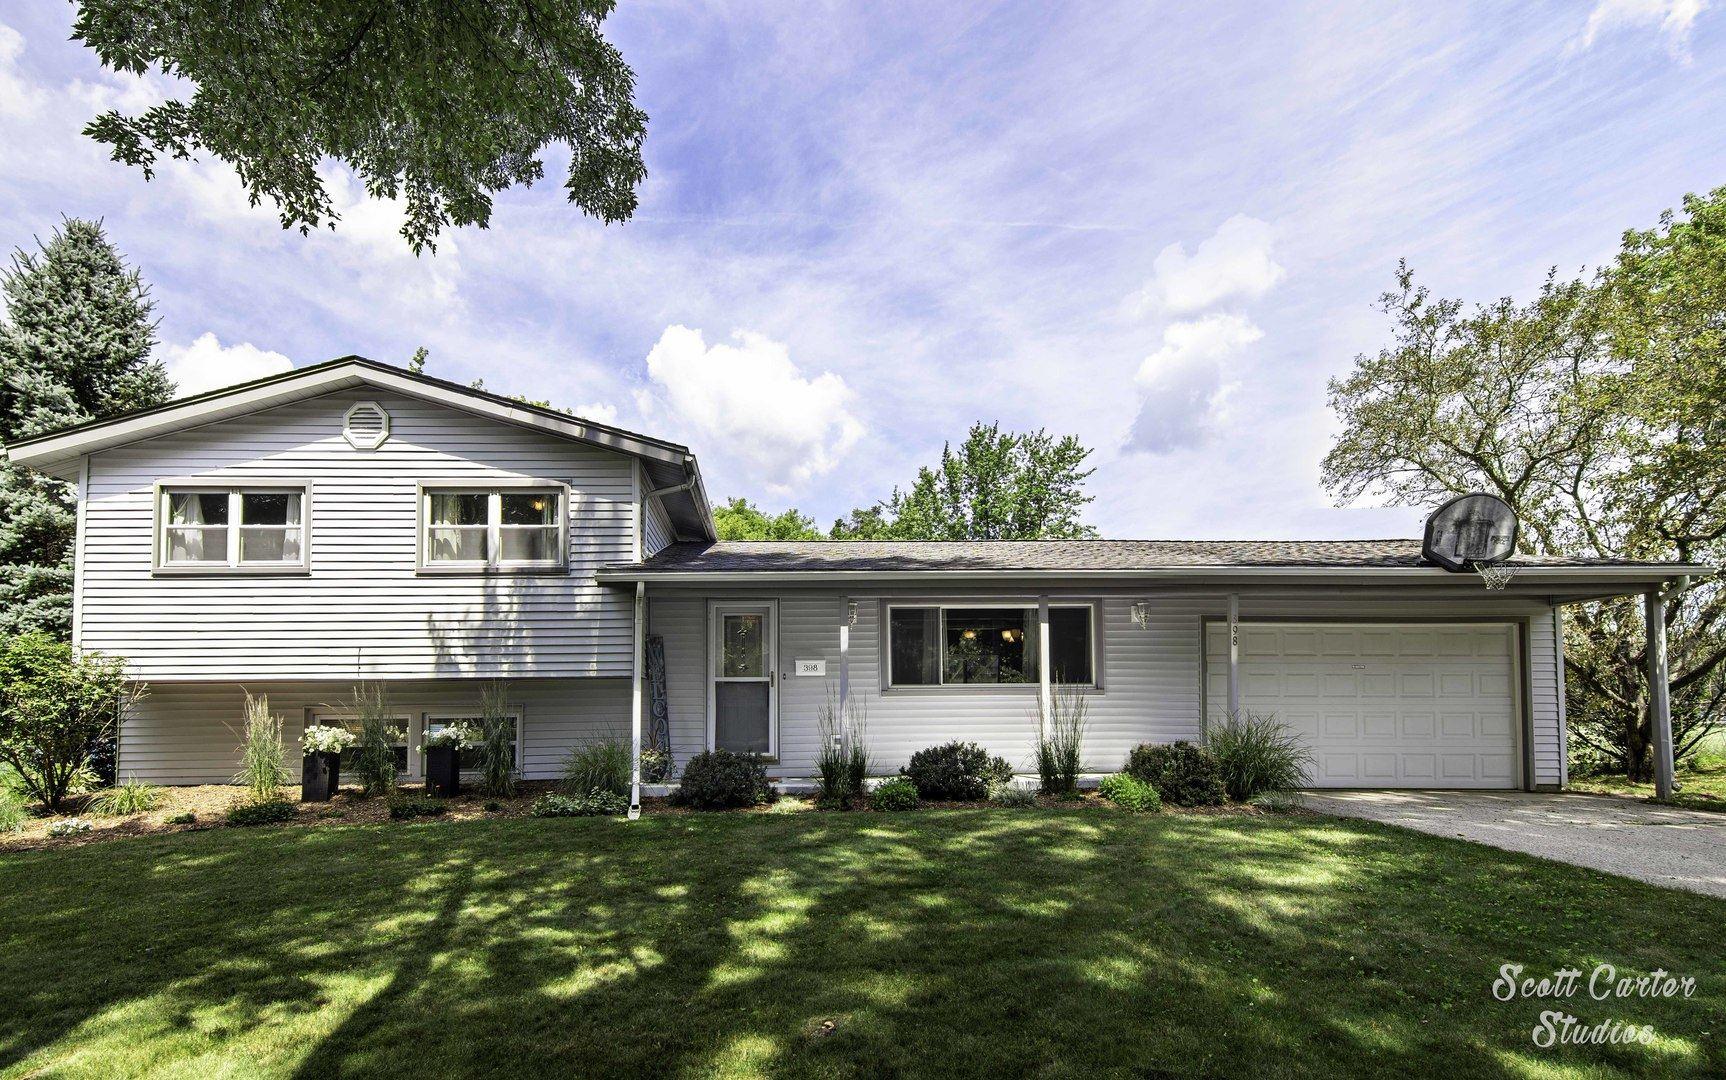 398 Heisler Court, Crystal Lake, IL 60014 - #: 10766515